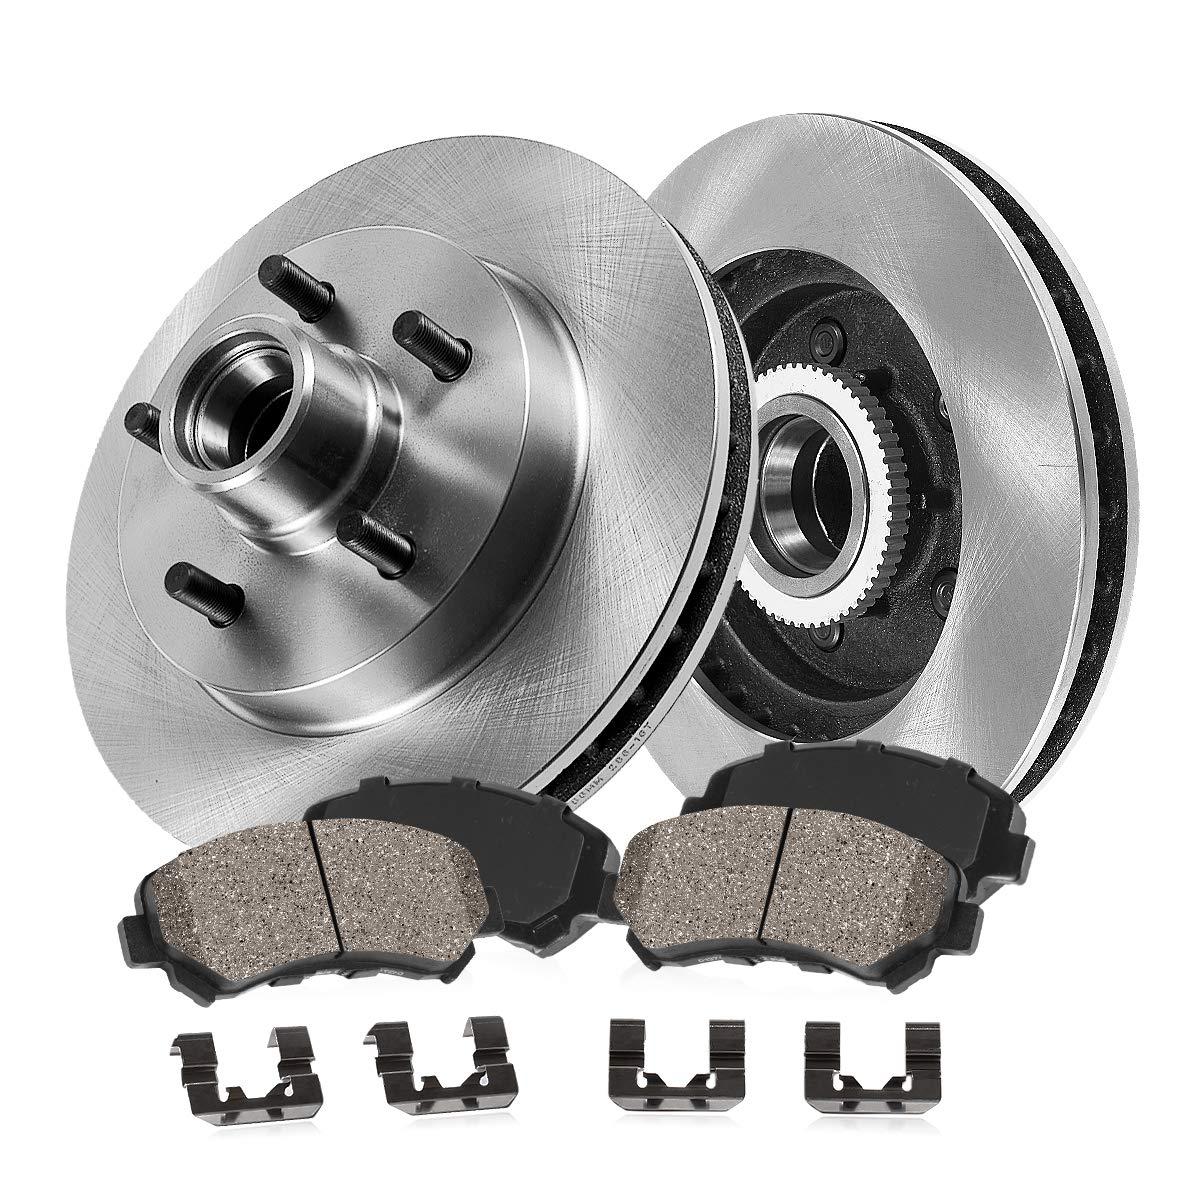 CRK13783 FRONT 308 mm Premium OE 5 Lug [2] Brake Disc Rotors + [4] Ceramic Brake Pads + Clips